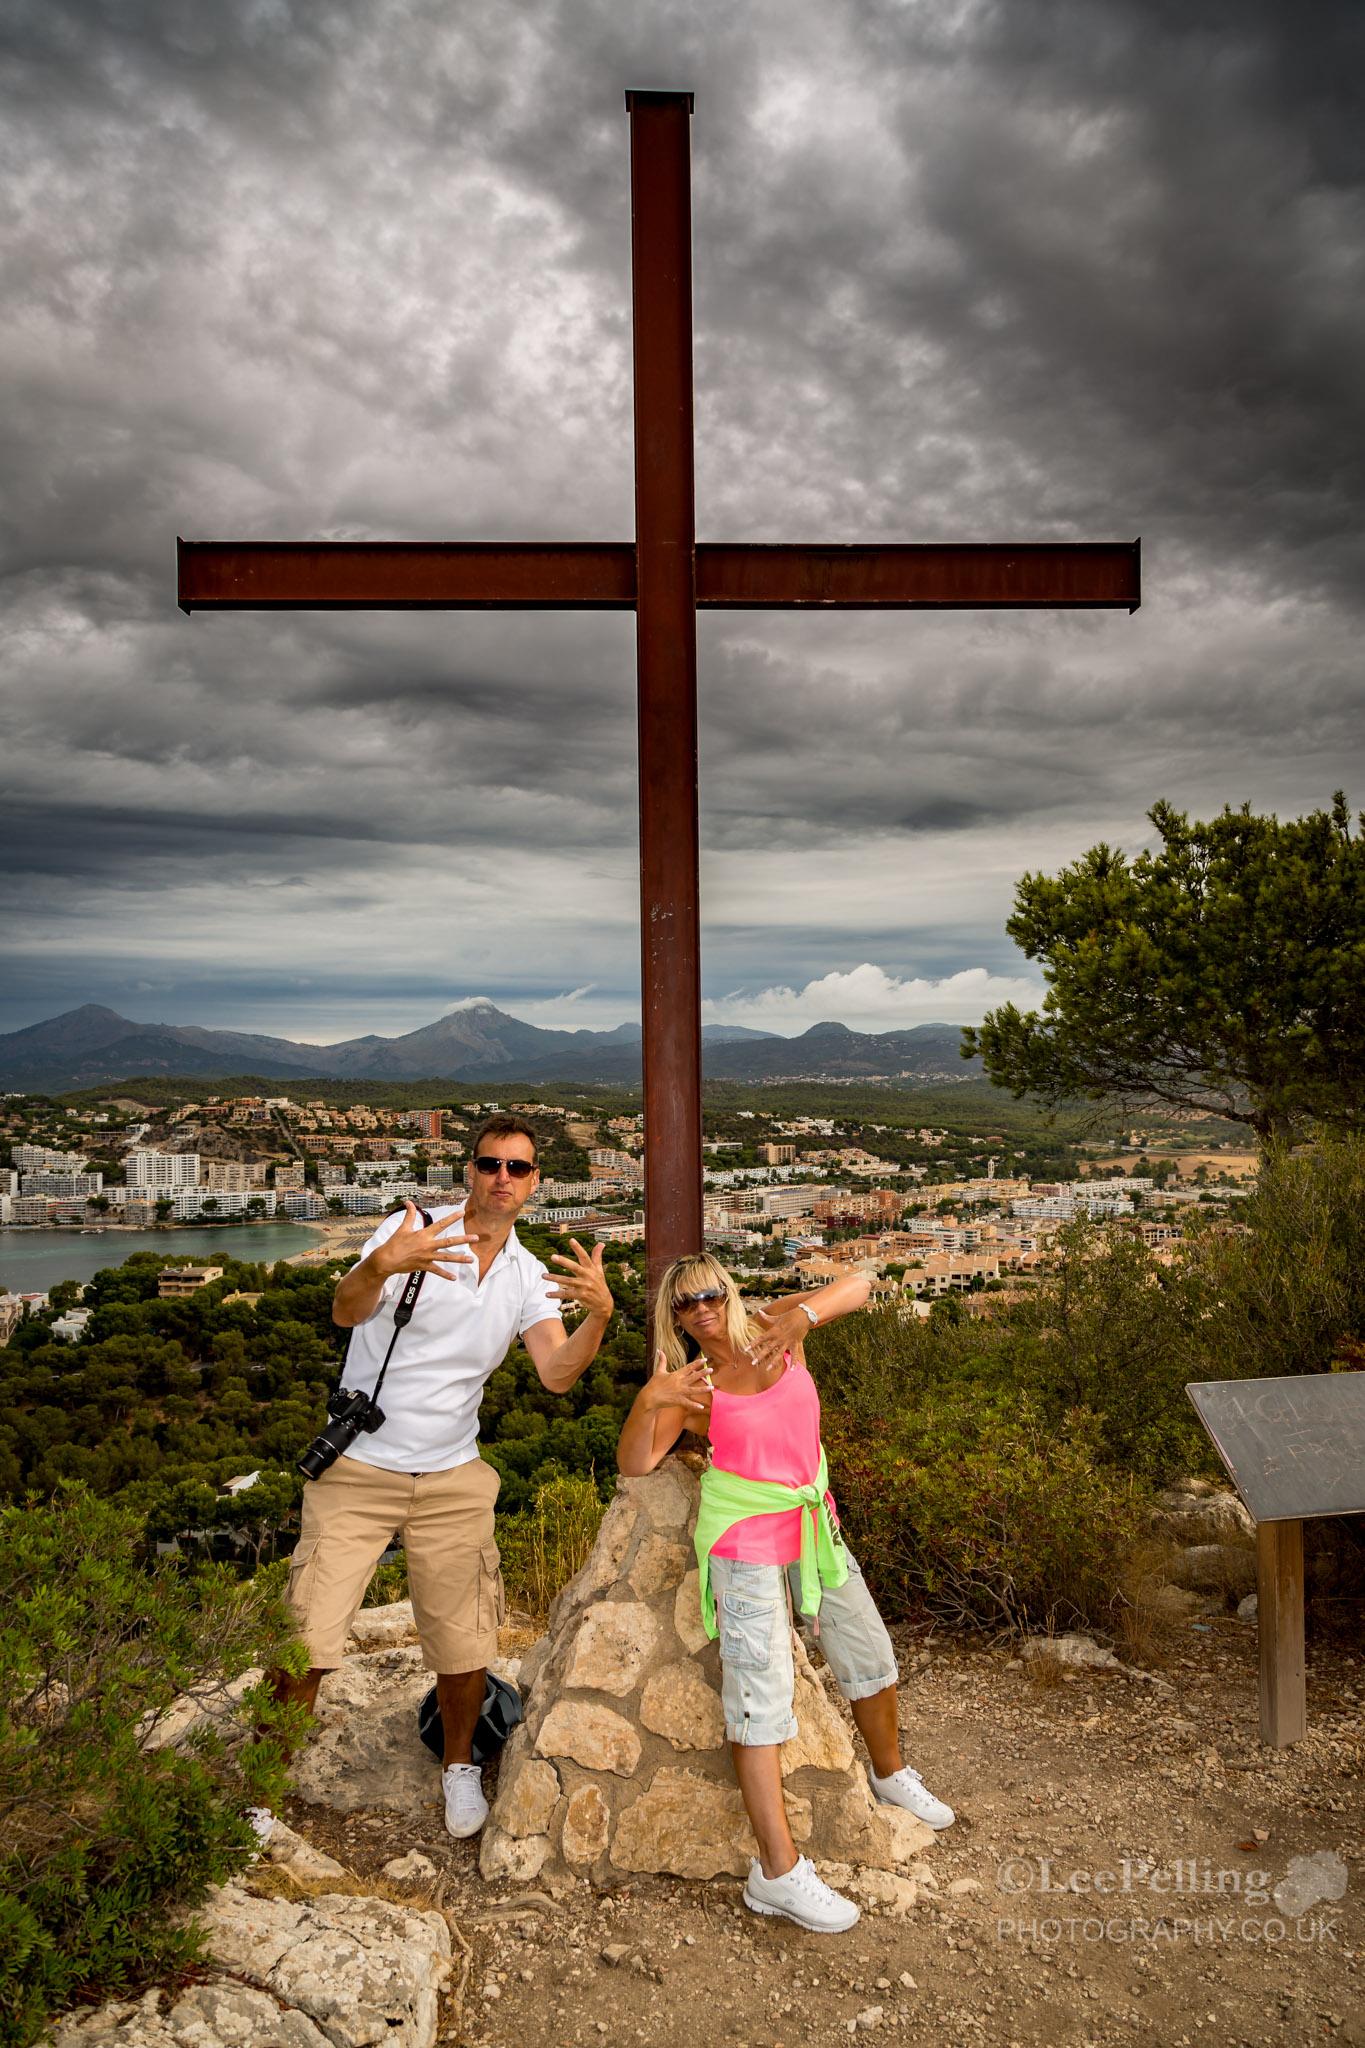 Deb and Paul at the Cross Santa Ponsa